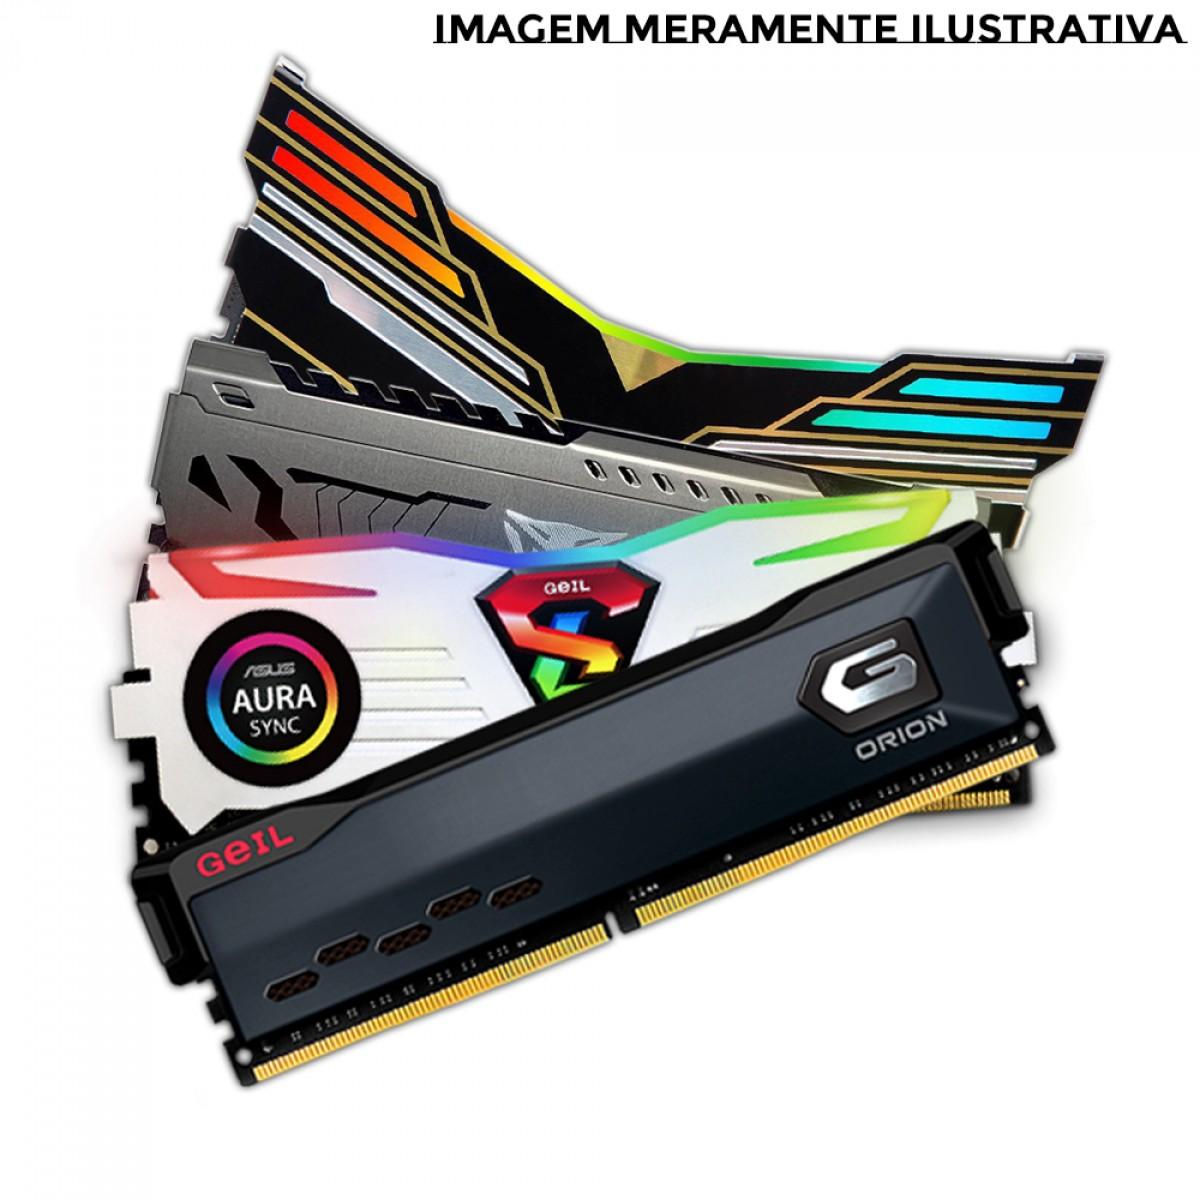 Kit Upgrade, Asus TUF B360M-Plus Gaming/BR + Intel Core I3 9100F + 8GB DDR4 3000MHz